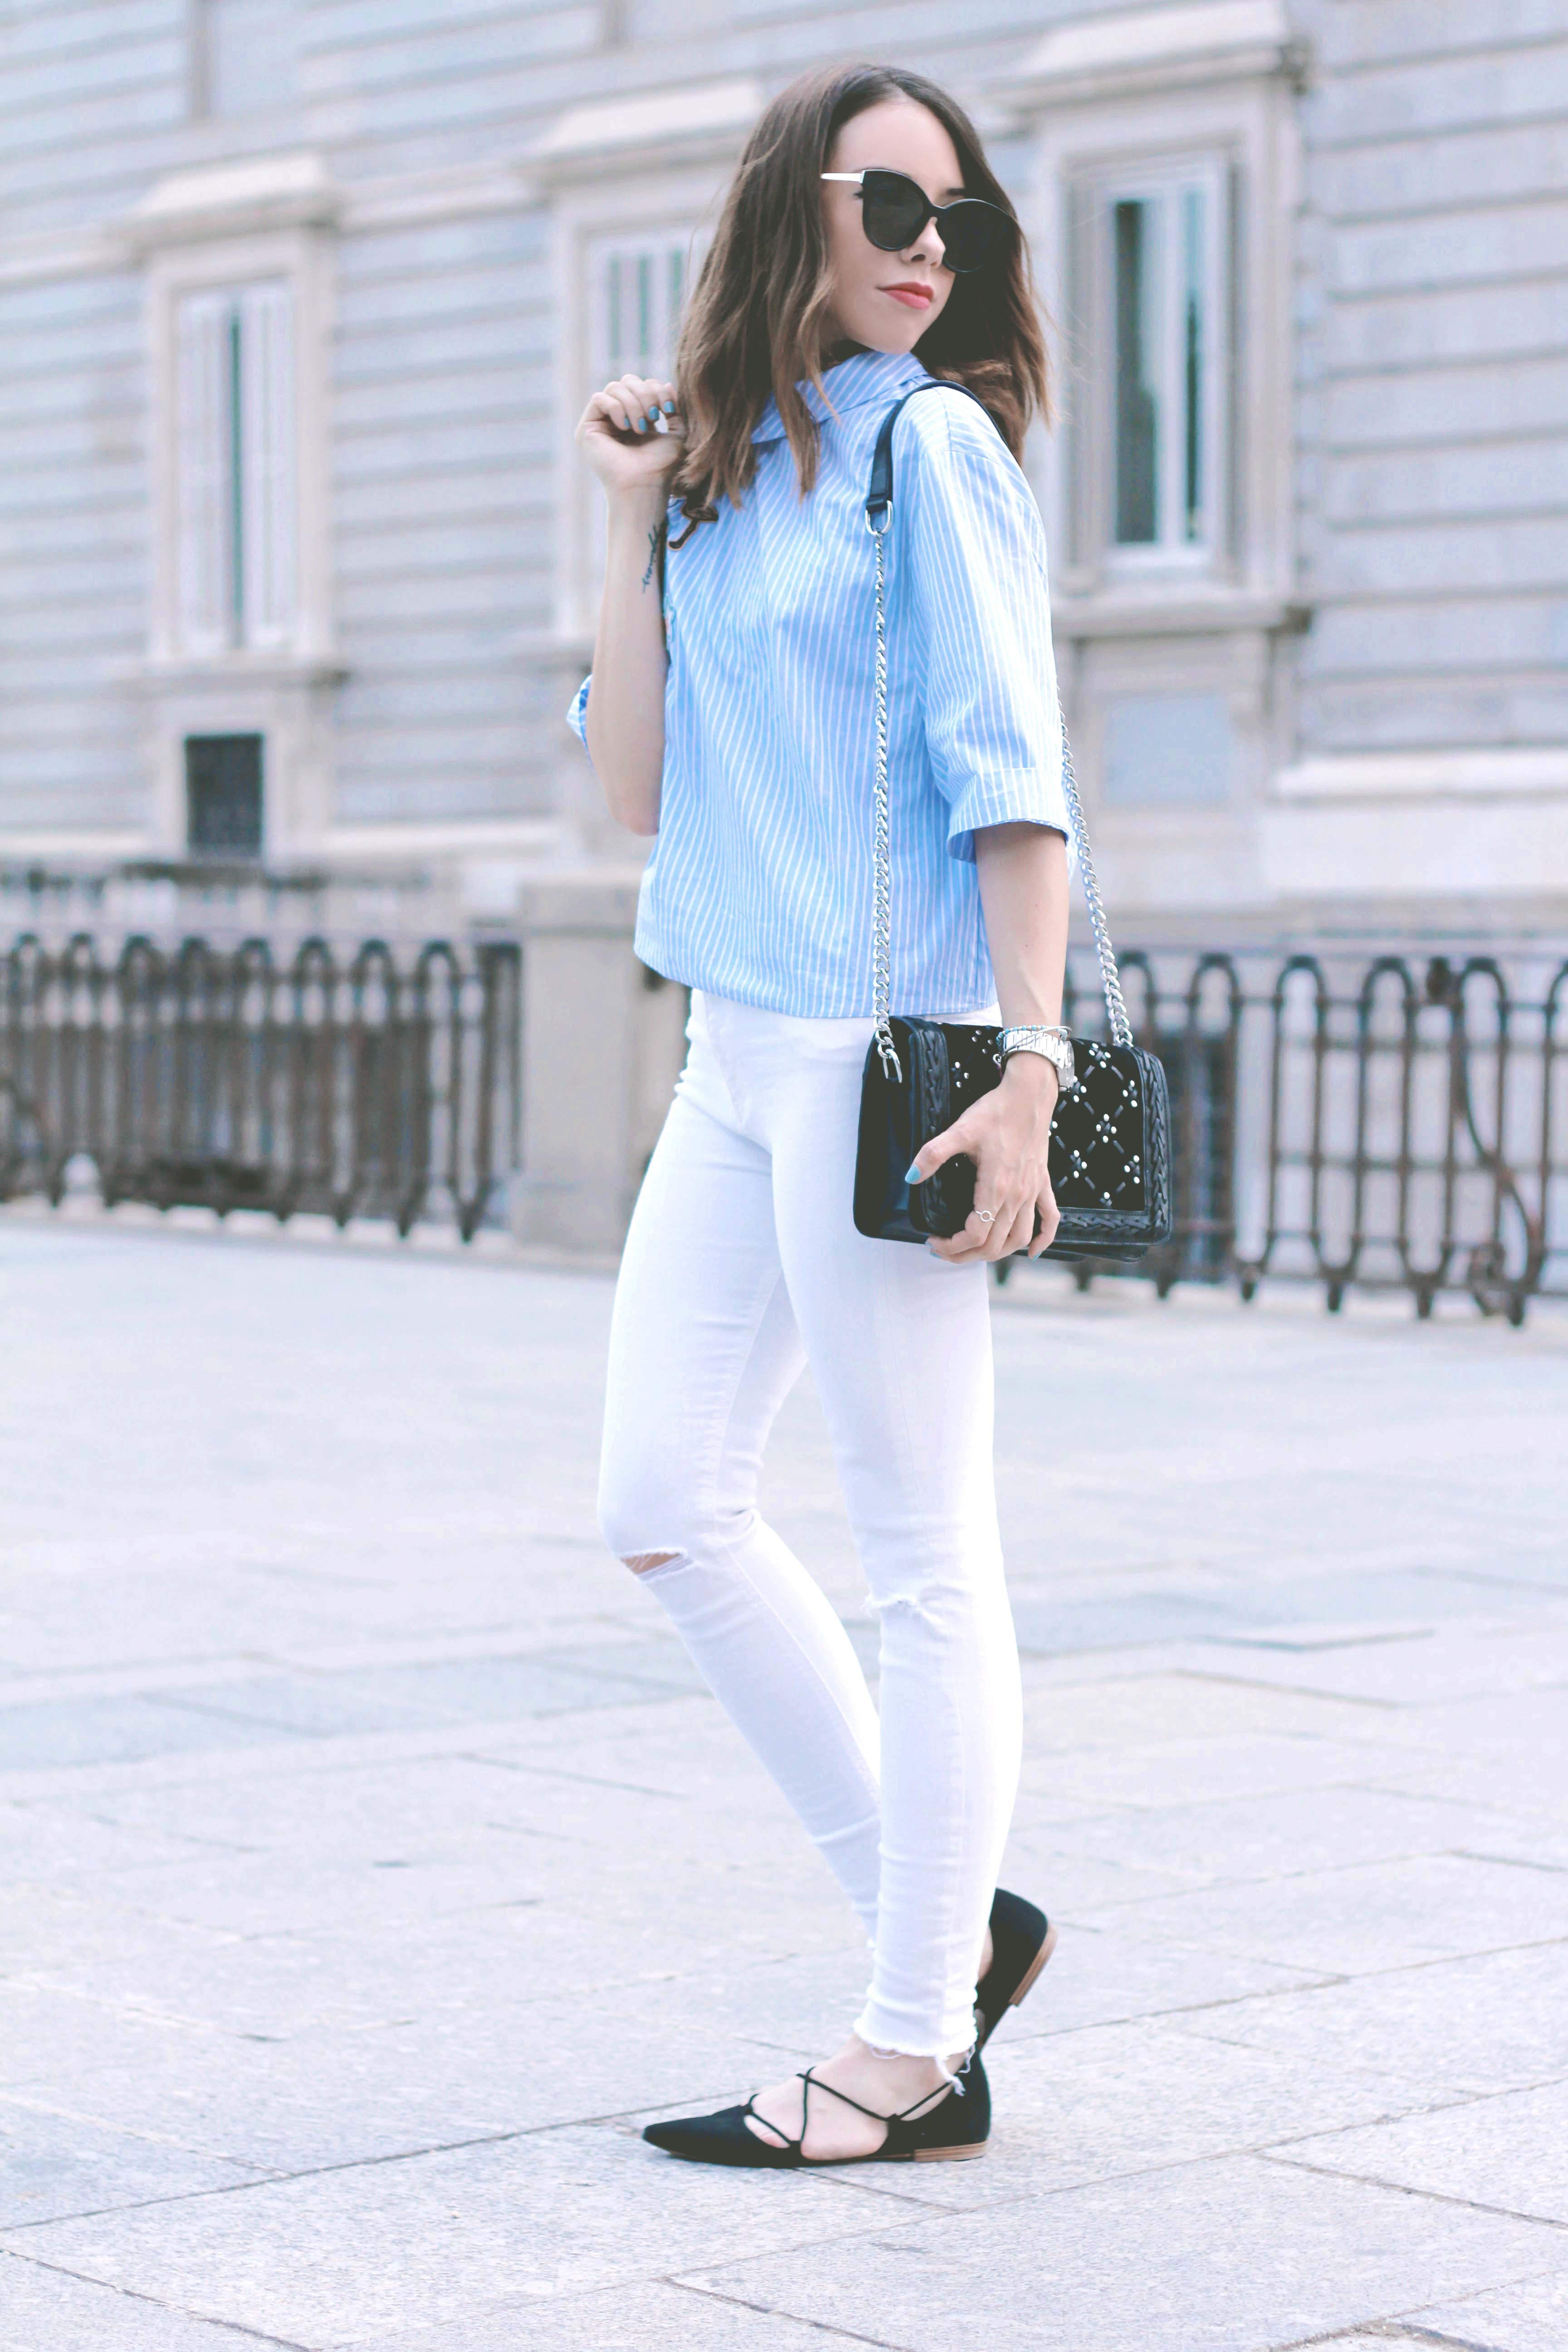 eli myredspirit outfit